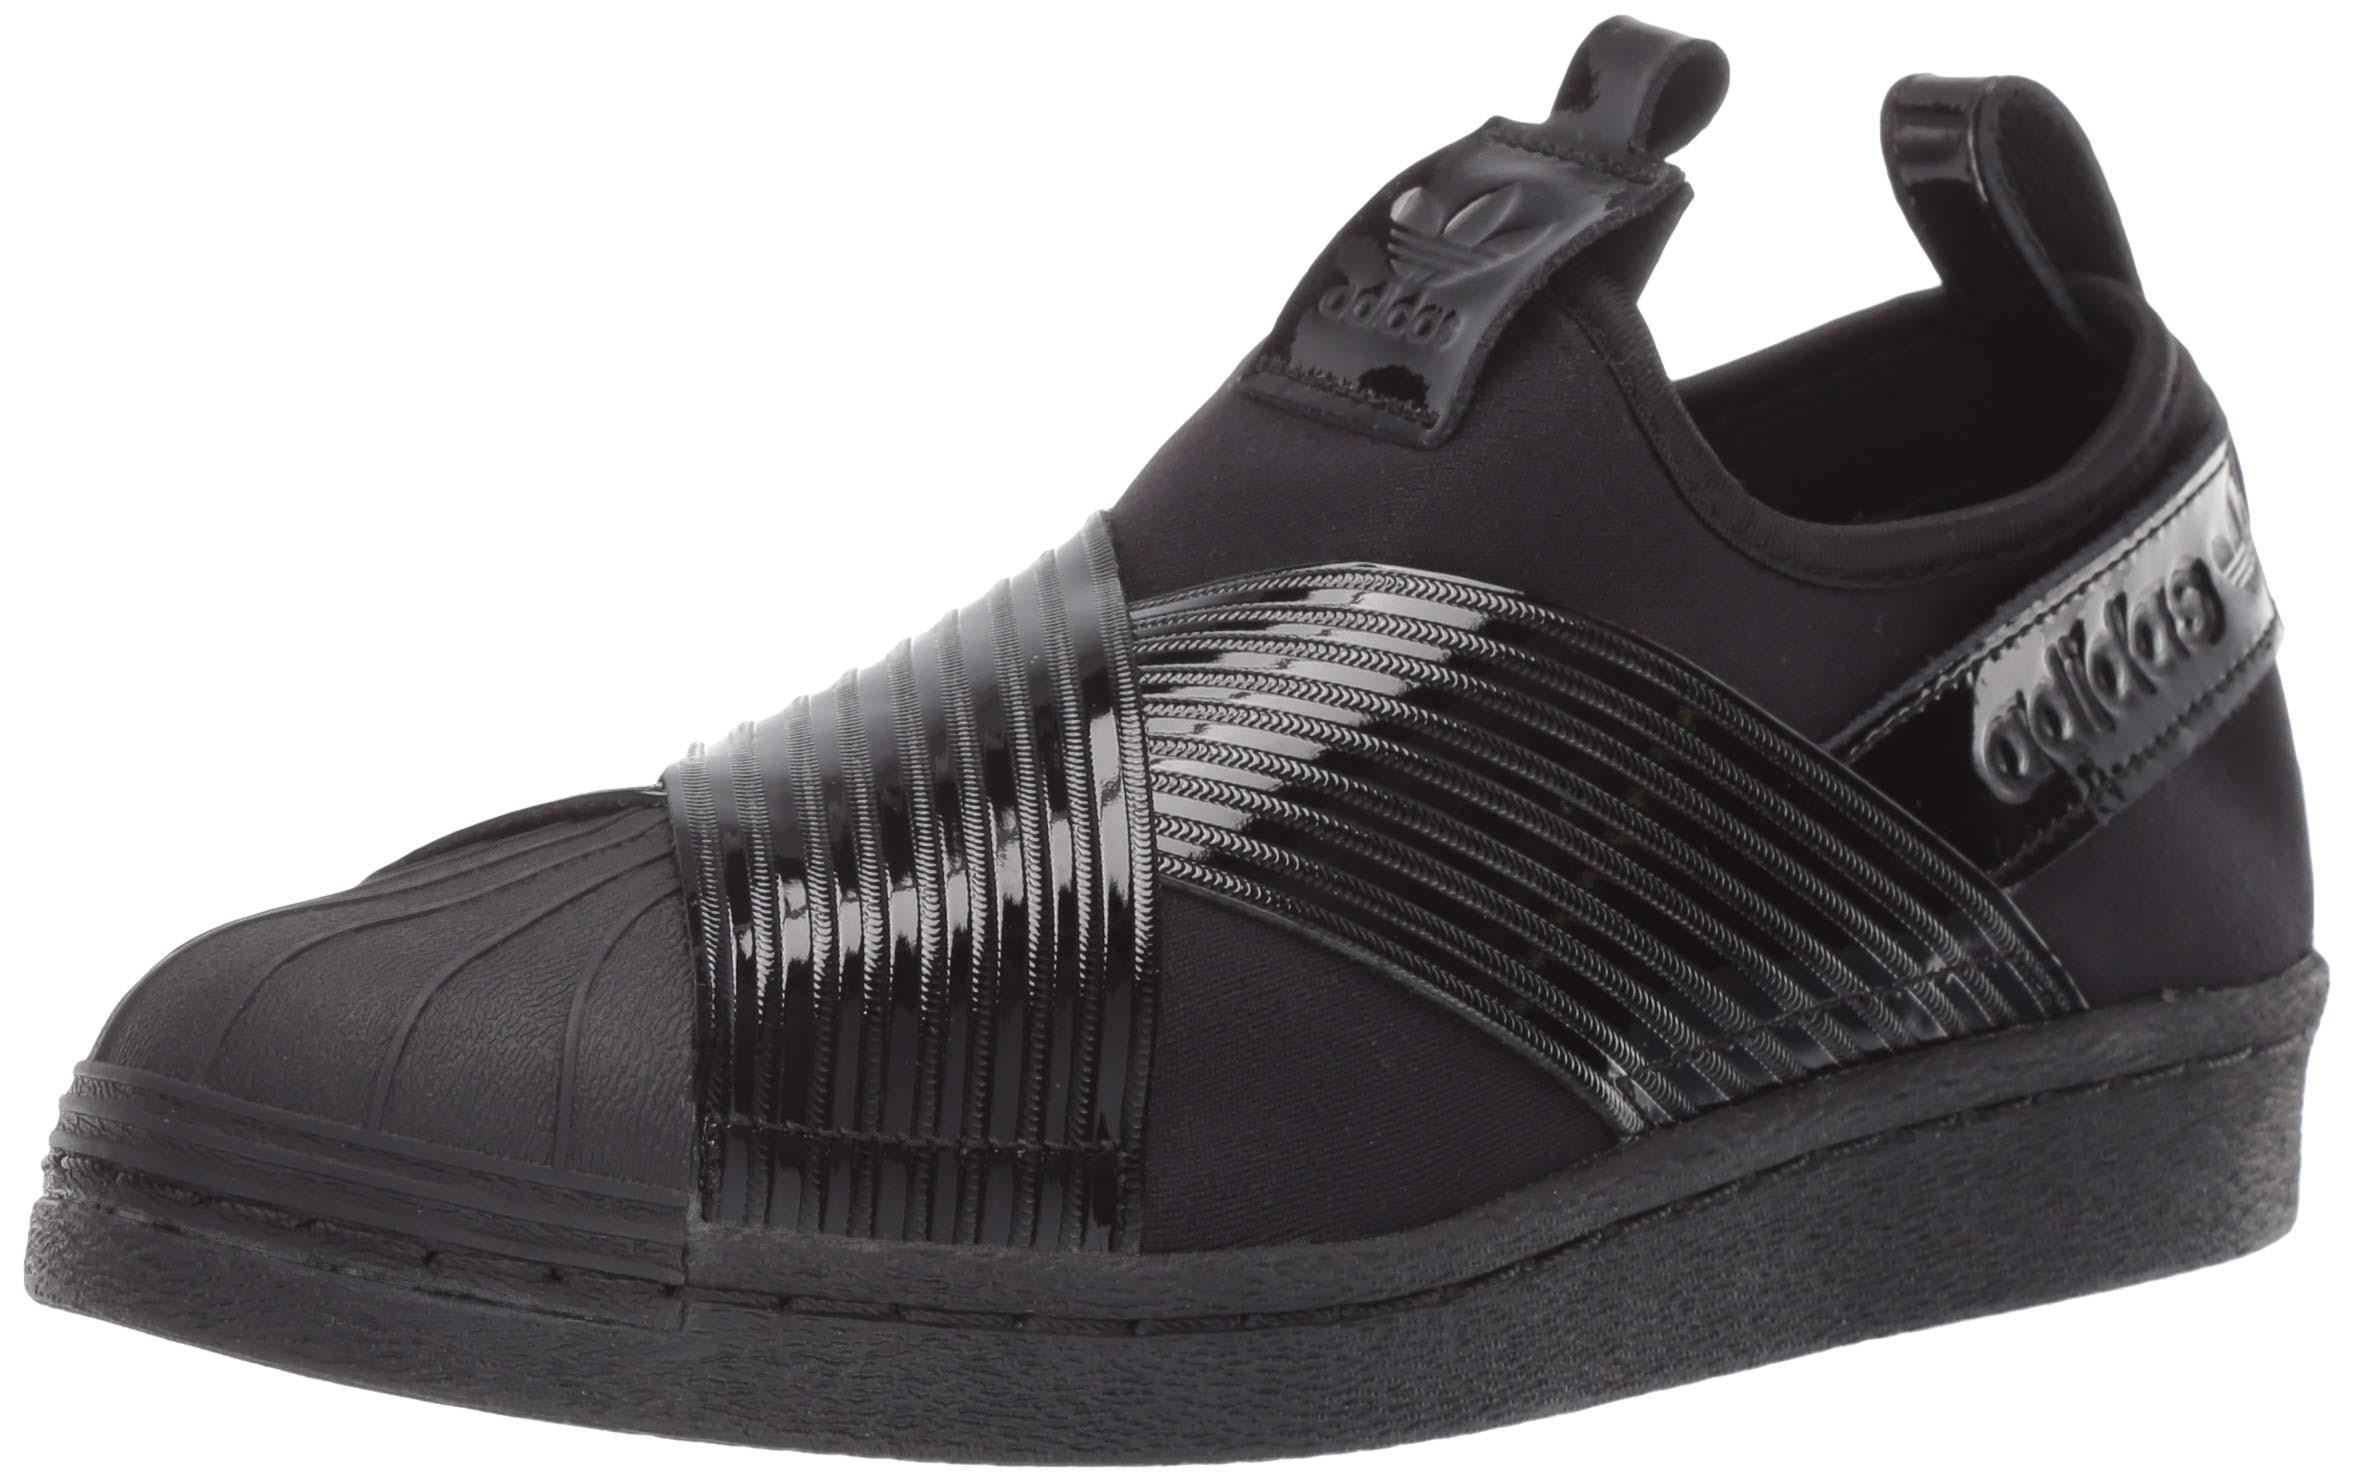 ShoesDonna Slip Superstar on Adidas 5 5 Core BlackPurple Collegiale Nero MSVqzLpGU